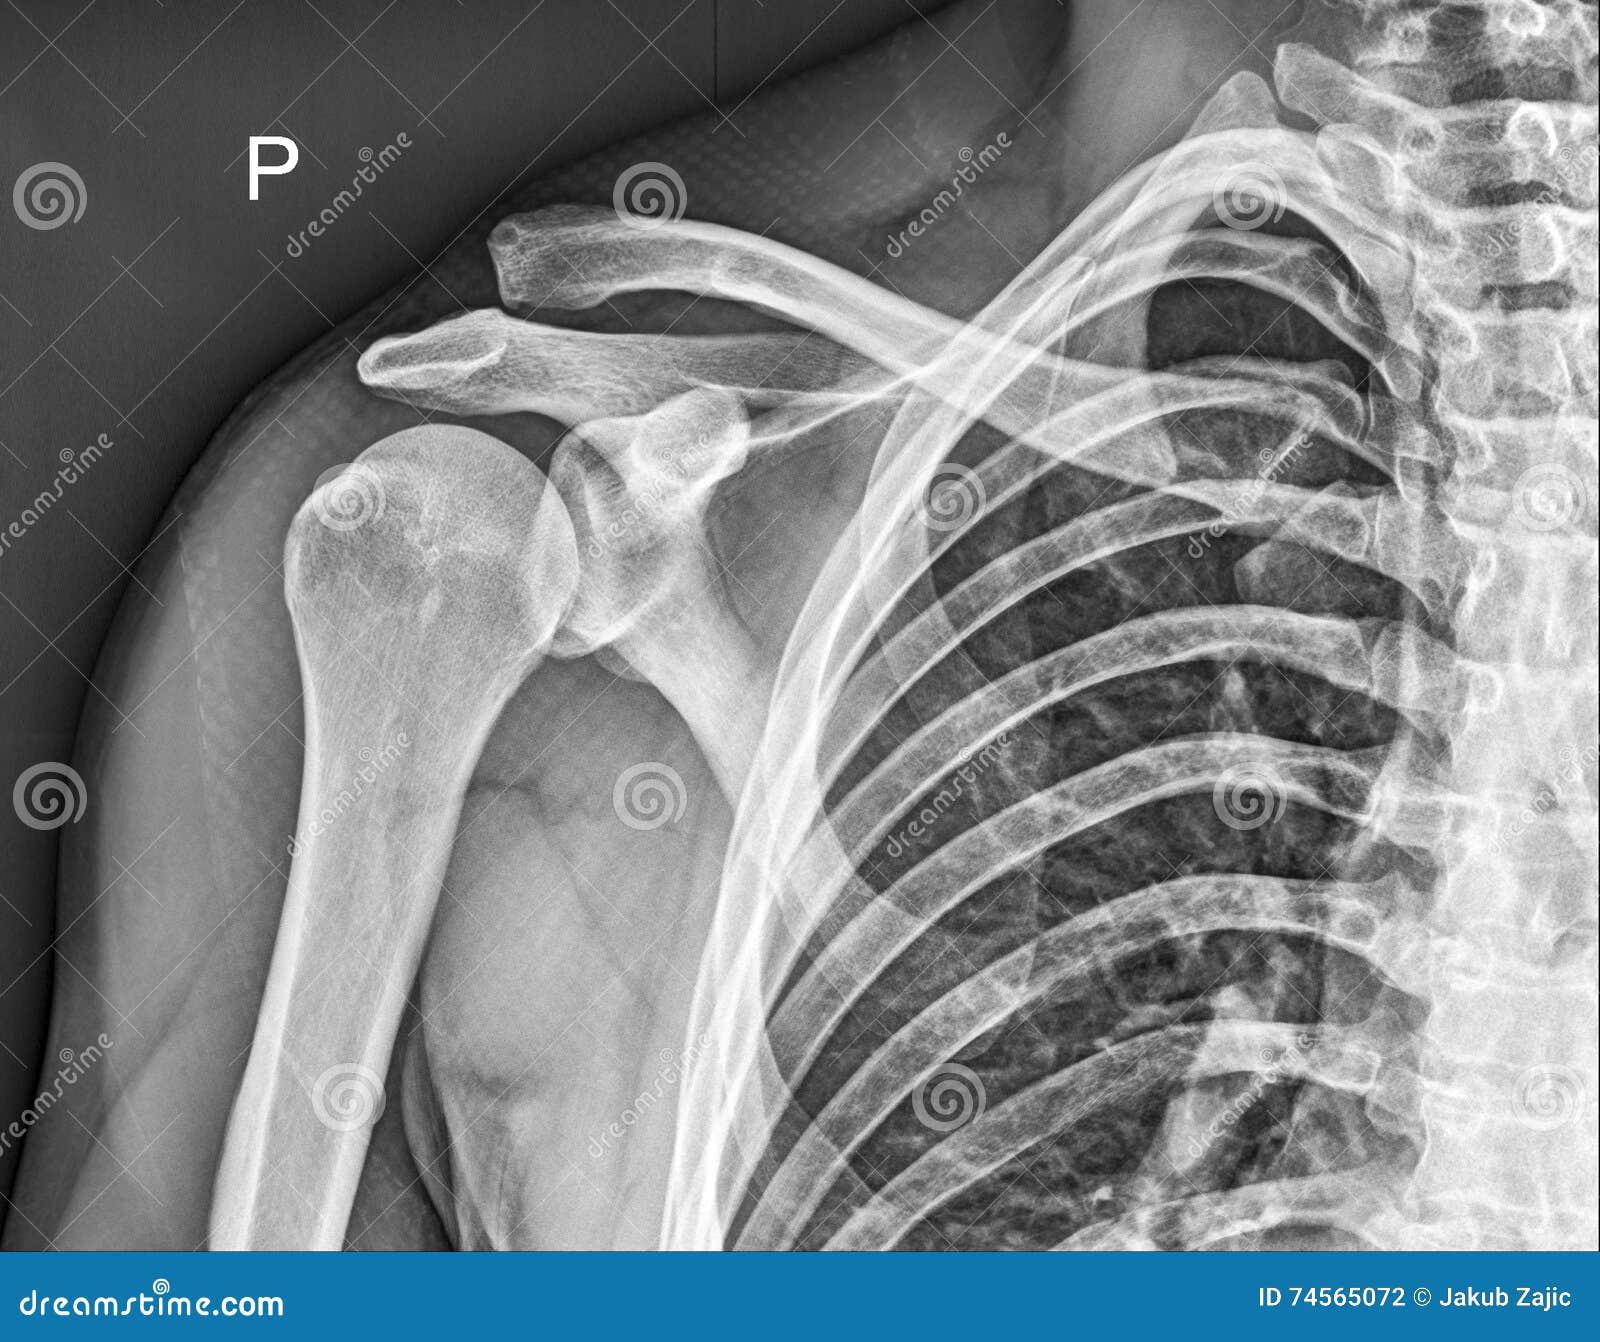 Clavicle Bone, Shoulder Medical Xray Stock Photo - Image of broken ...